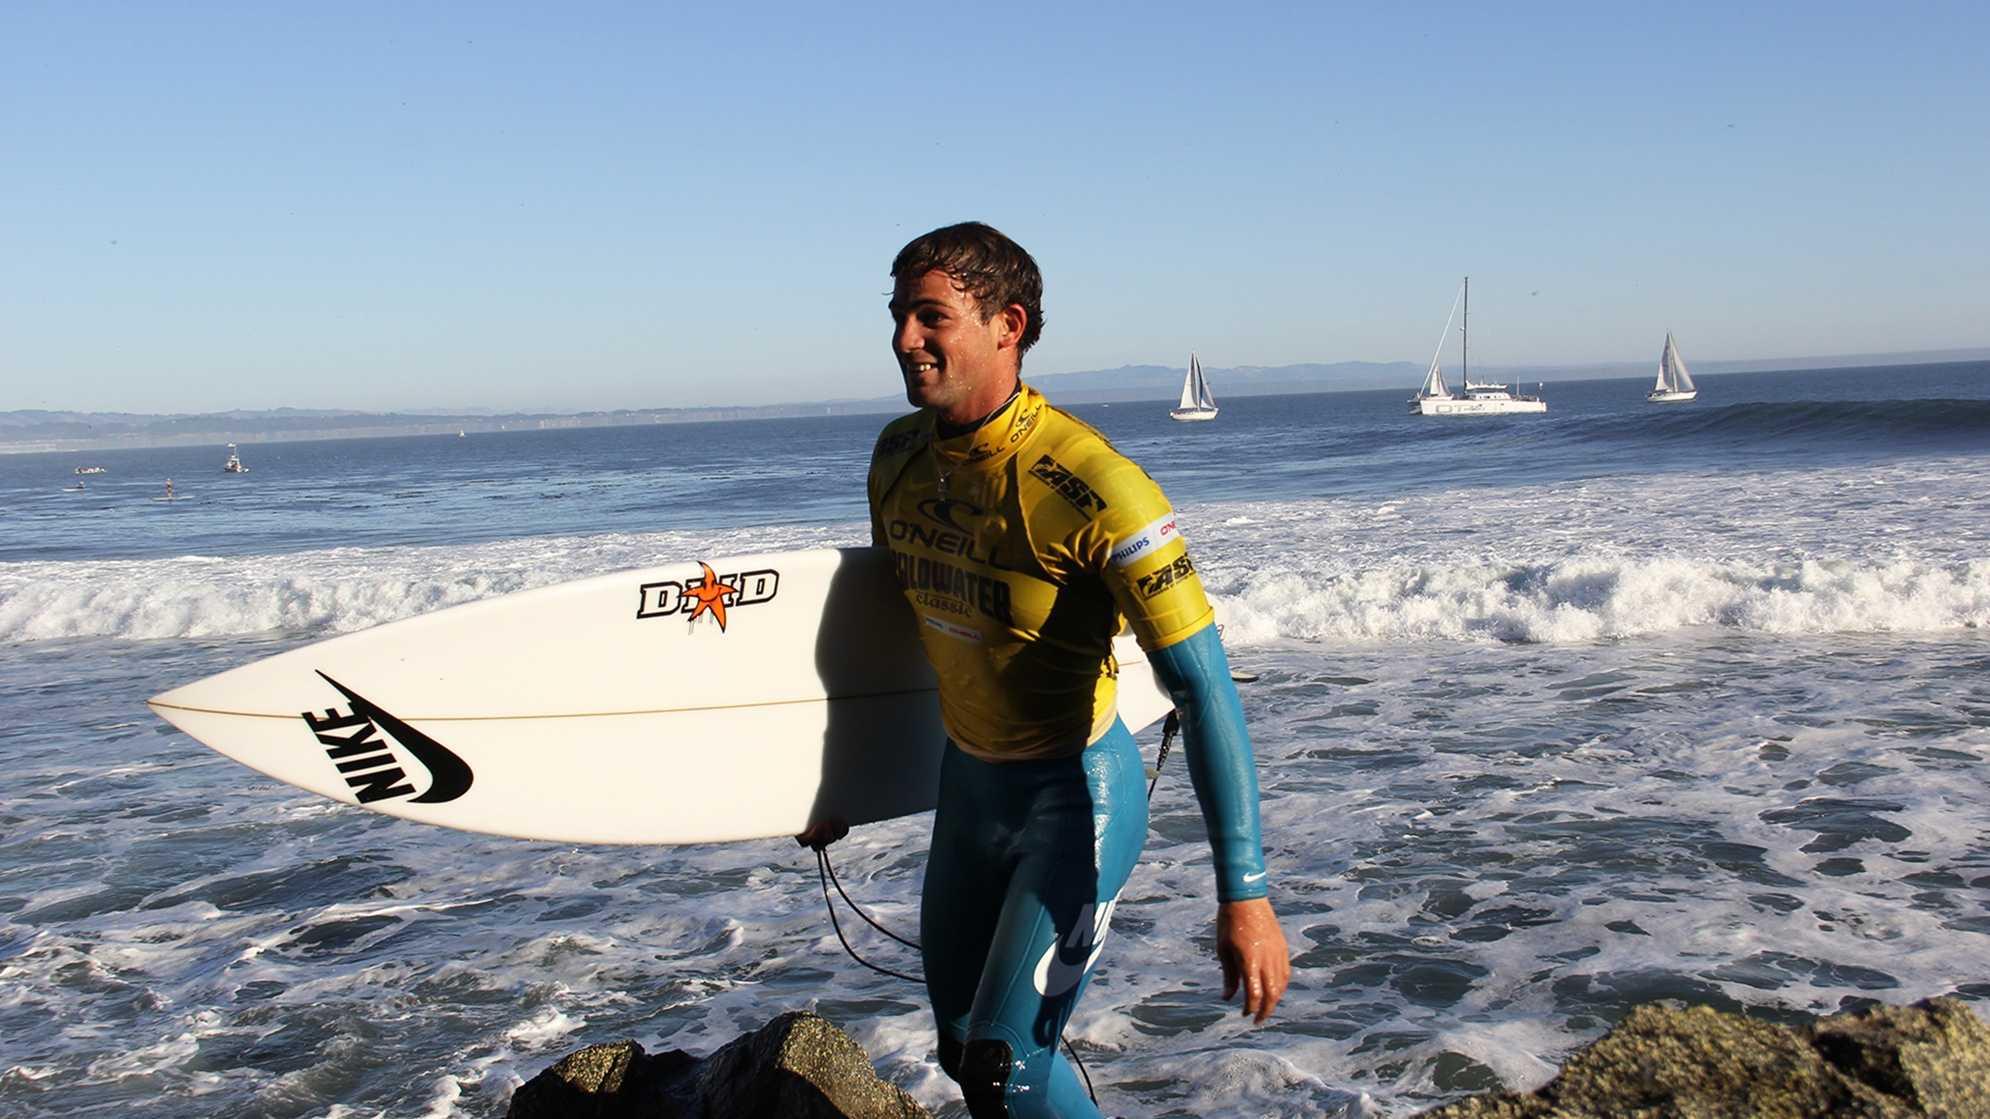 Alejo Muniz, of Brazil, was feeling good after his Round 2 heat. (Nov. 4, 2012)